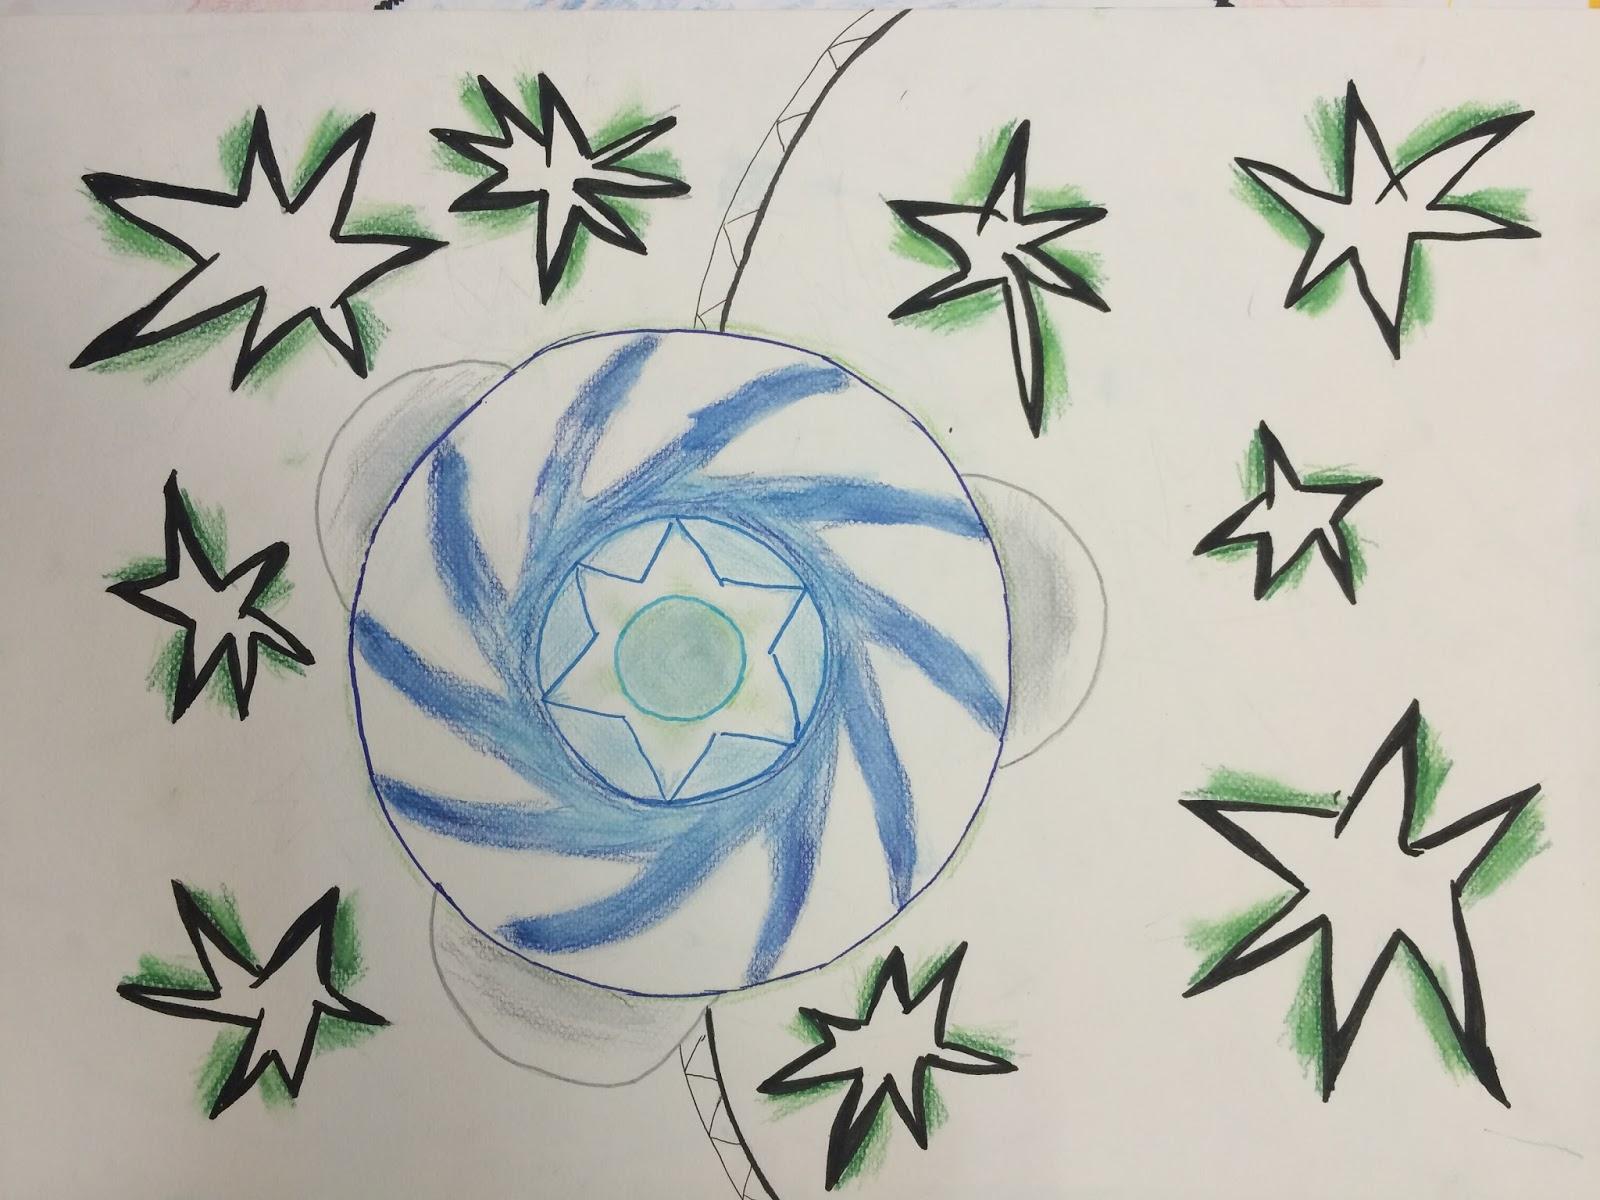 Elements Of Artistic Expression : ArtÍstic kostka basic elements of expression